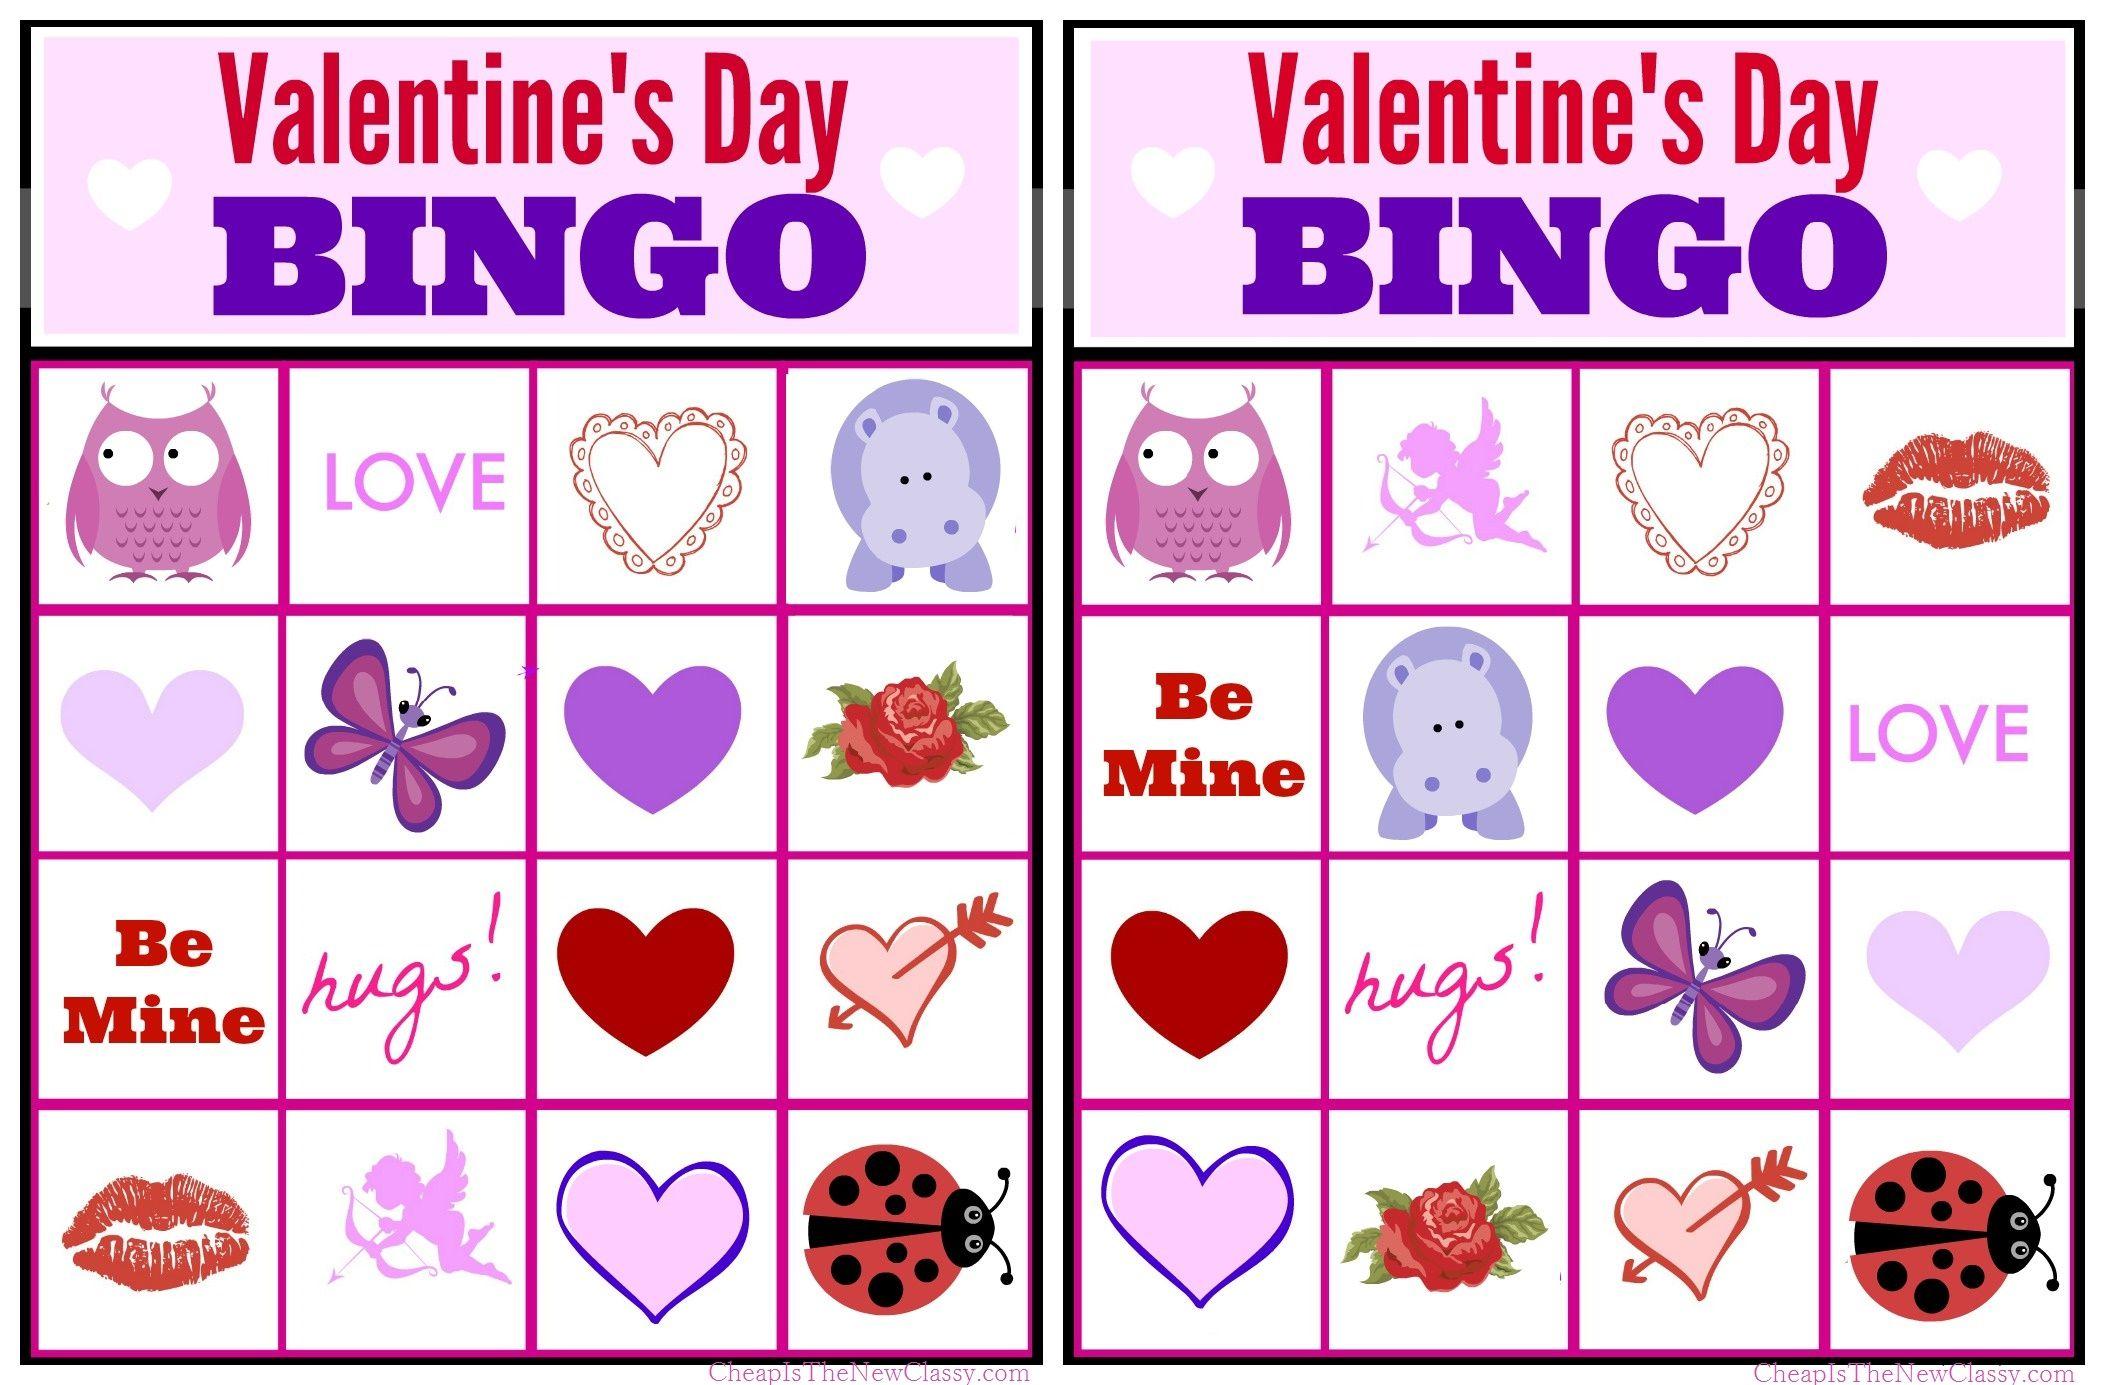 Valentines Day Ideas Valentine Bingo Game Printable For